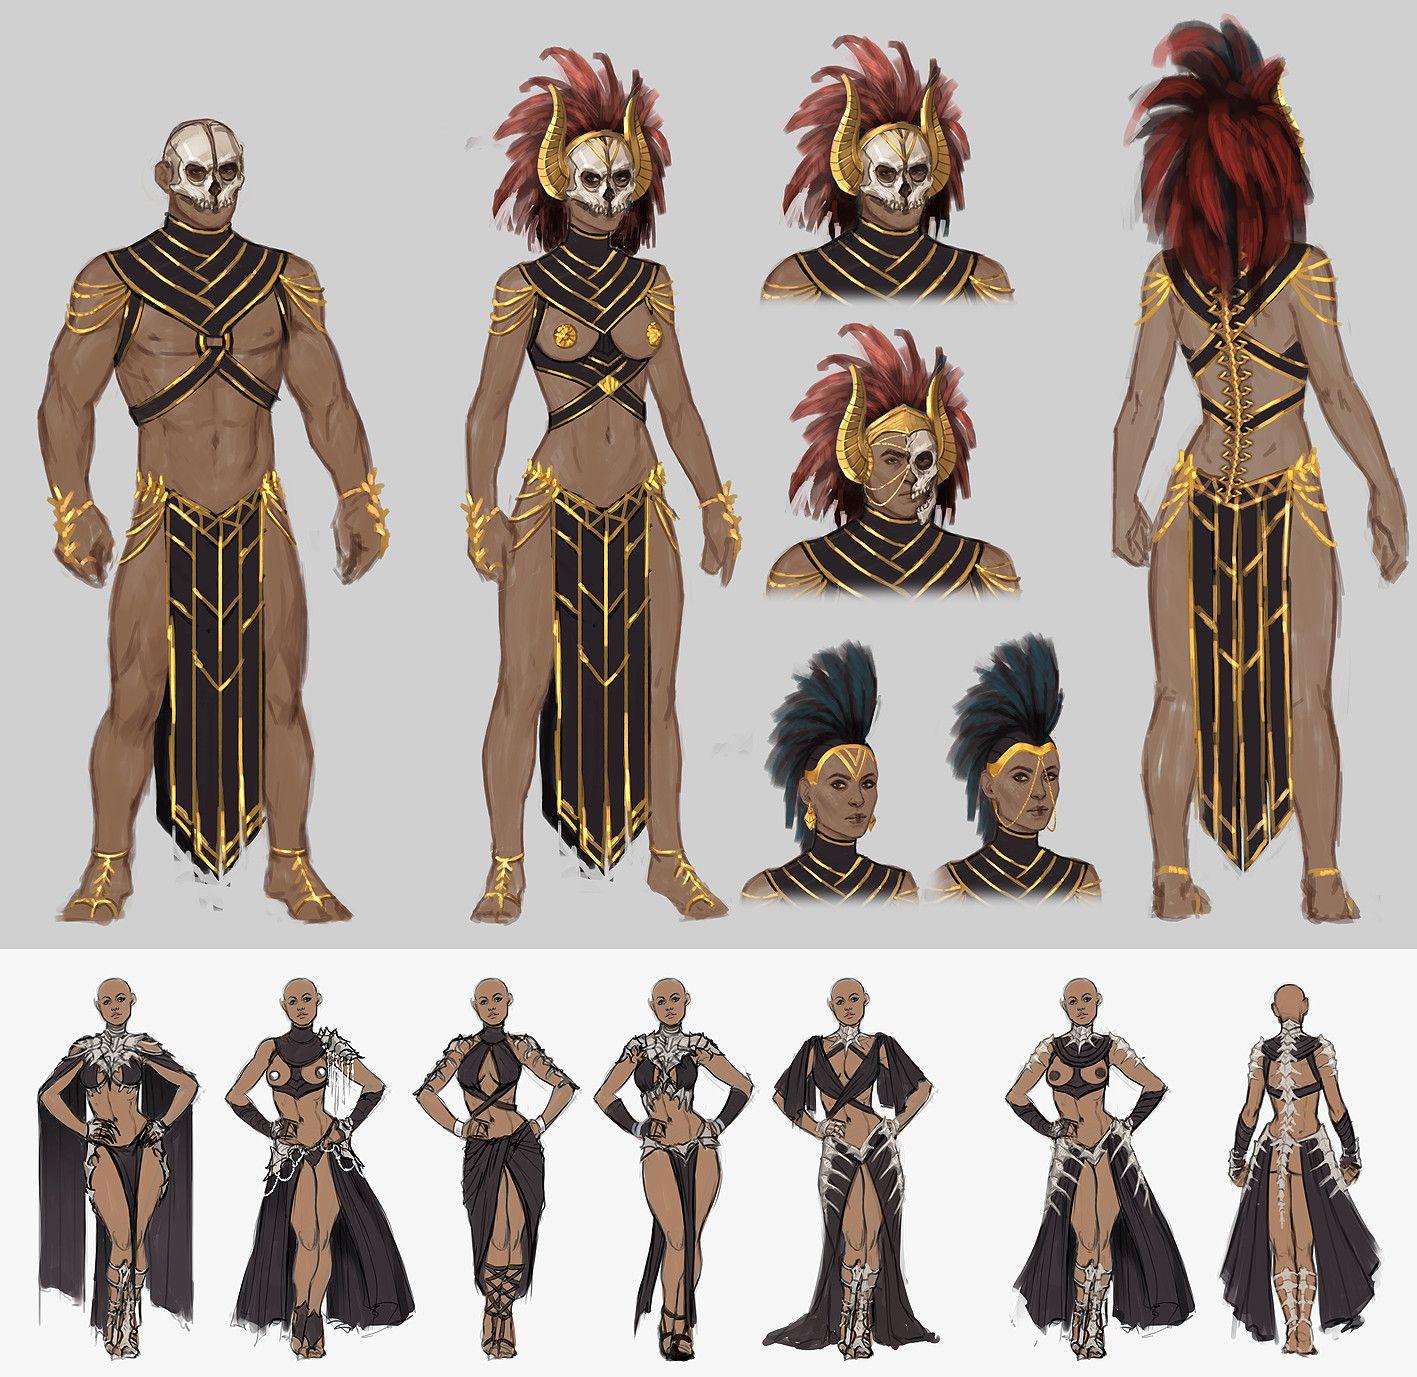 ArtStation - Conan Exiles costume concept art, Jenni